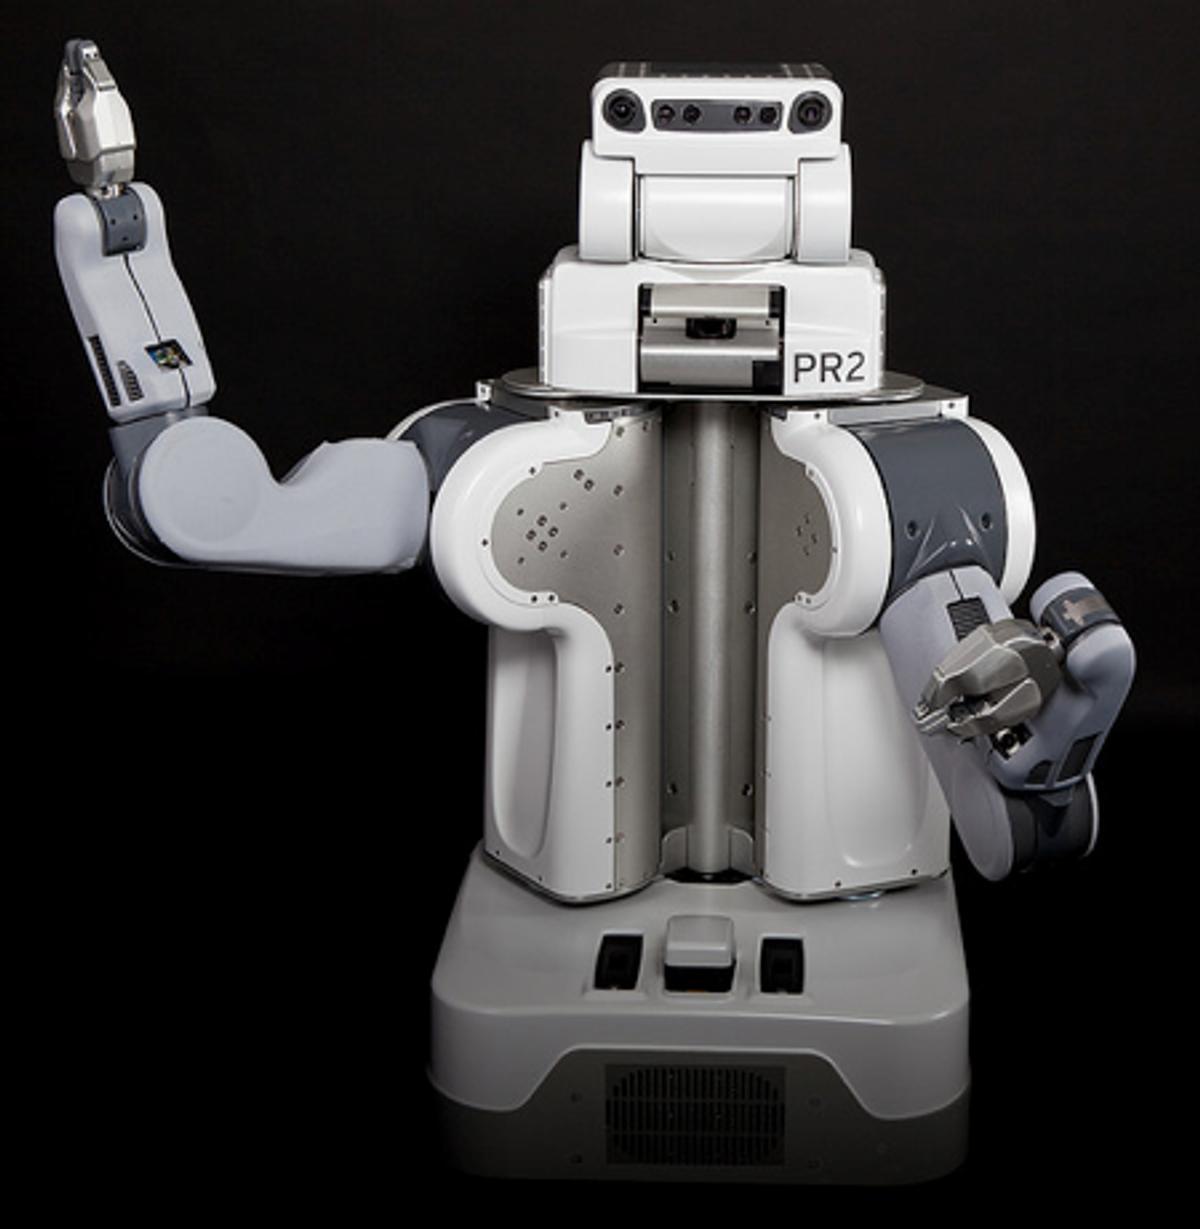 Willow Garage Sells First PR2 Robots